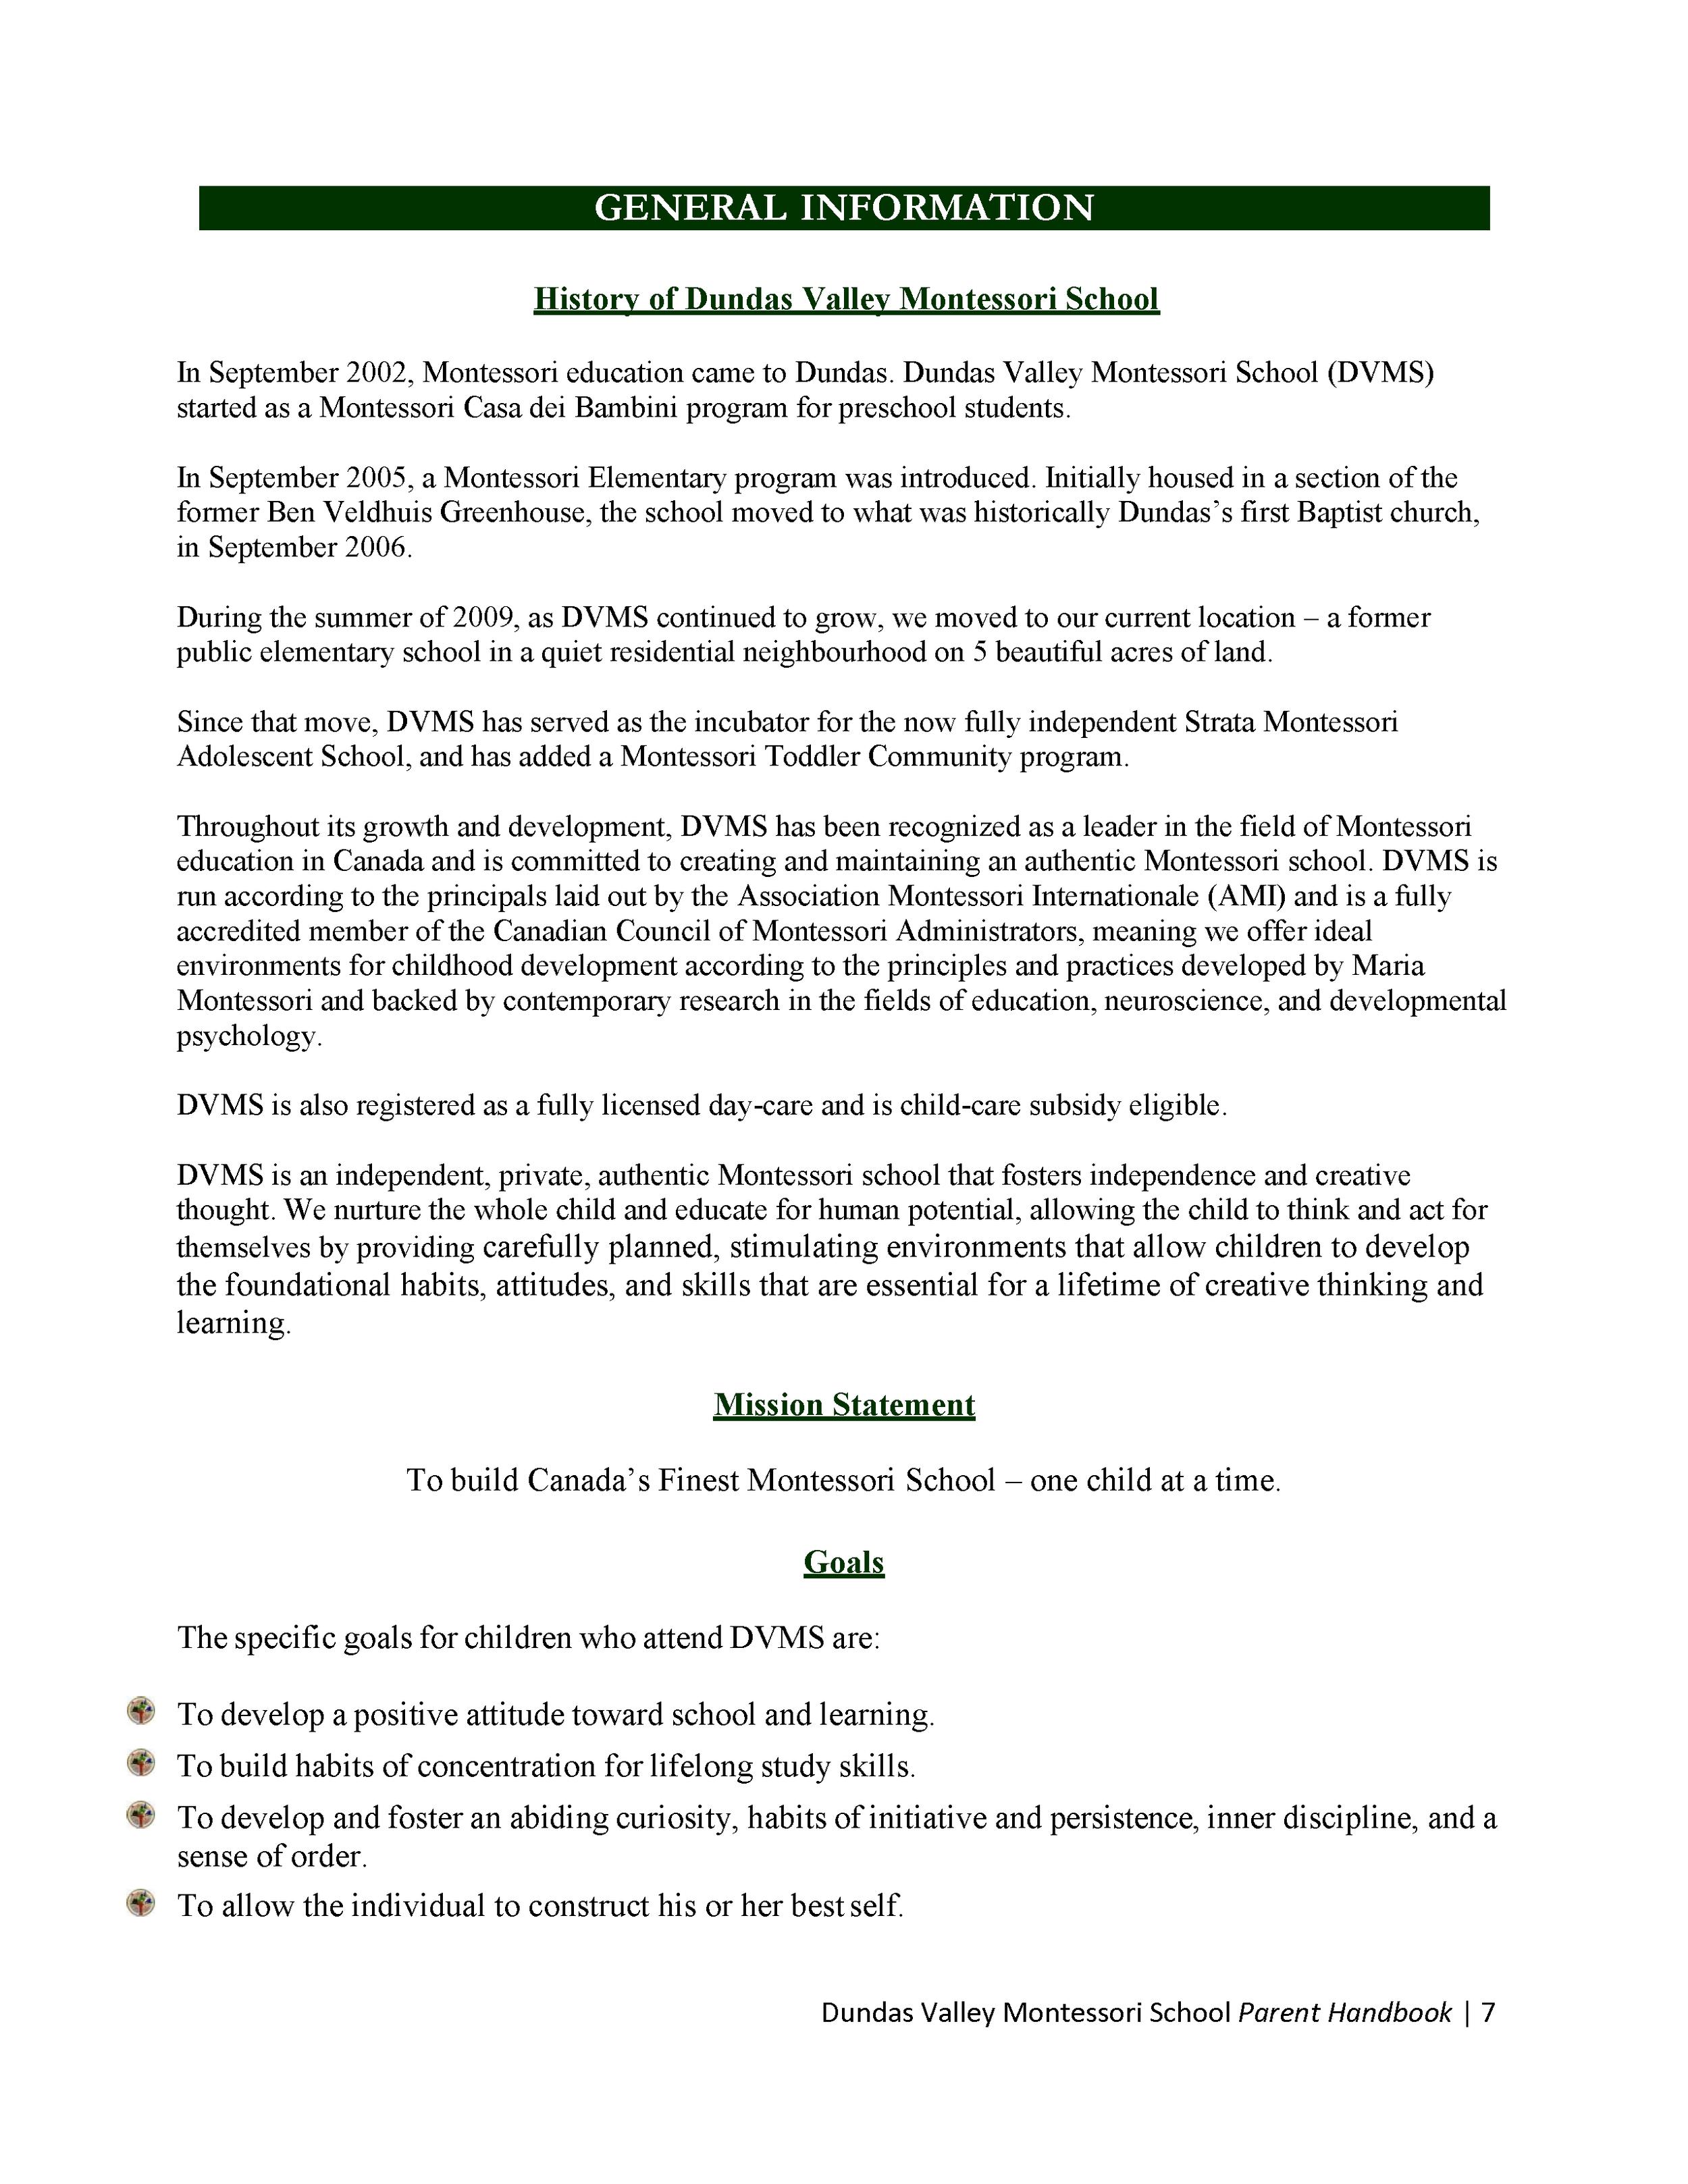 DVMS-Parent-Handbook-19-20_Page_009.png